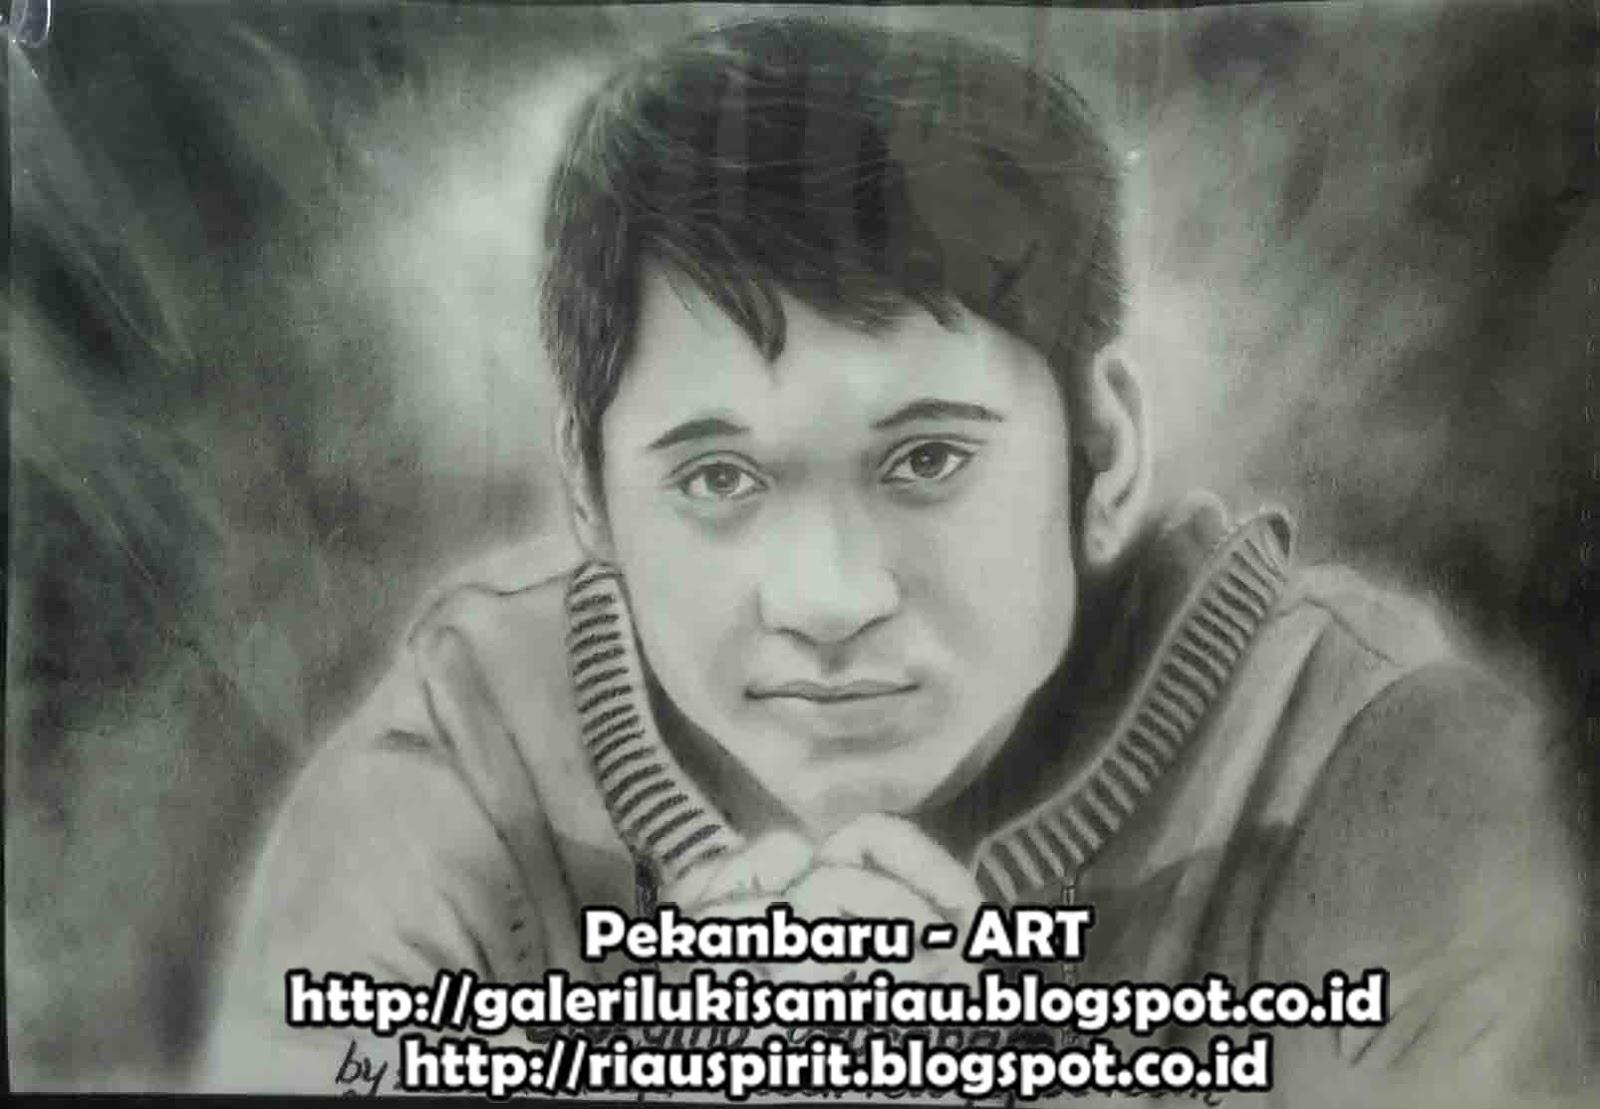 Wifi ID Pekanbaru ART GRATIS